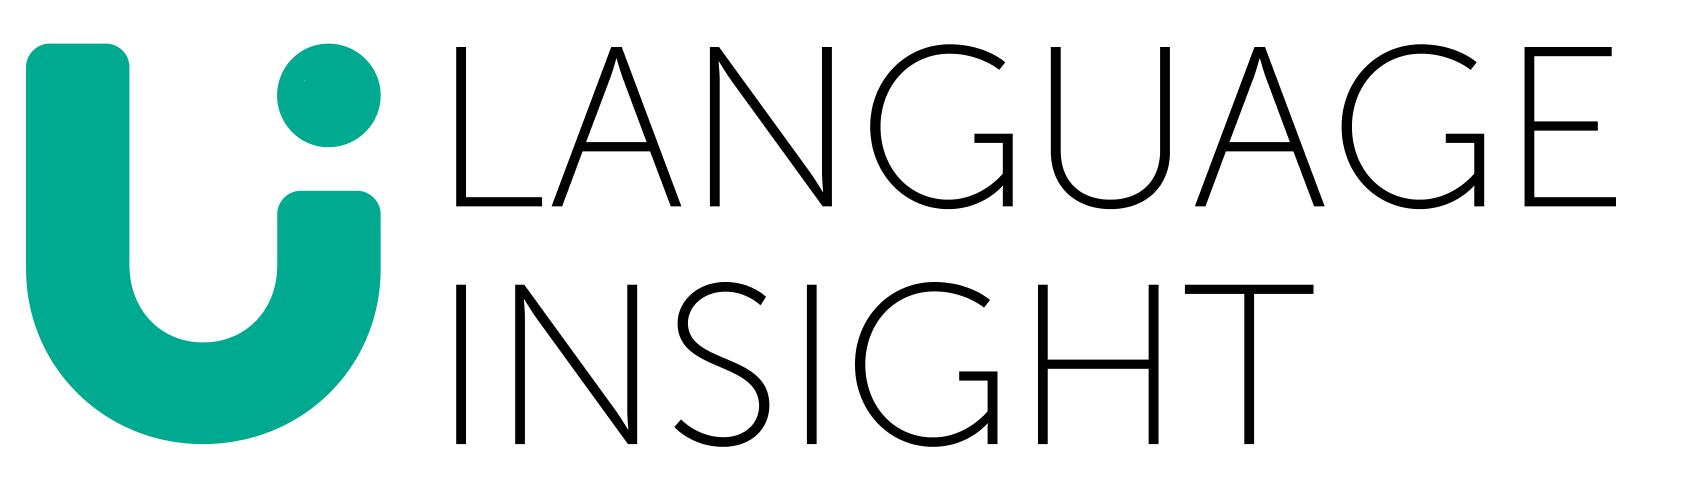 Language Insight Ltd Company Logo